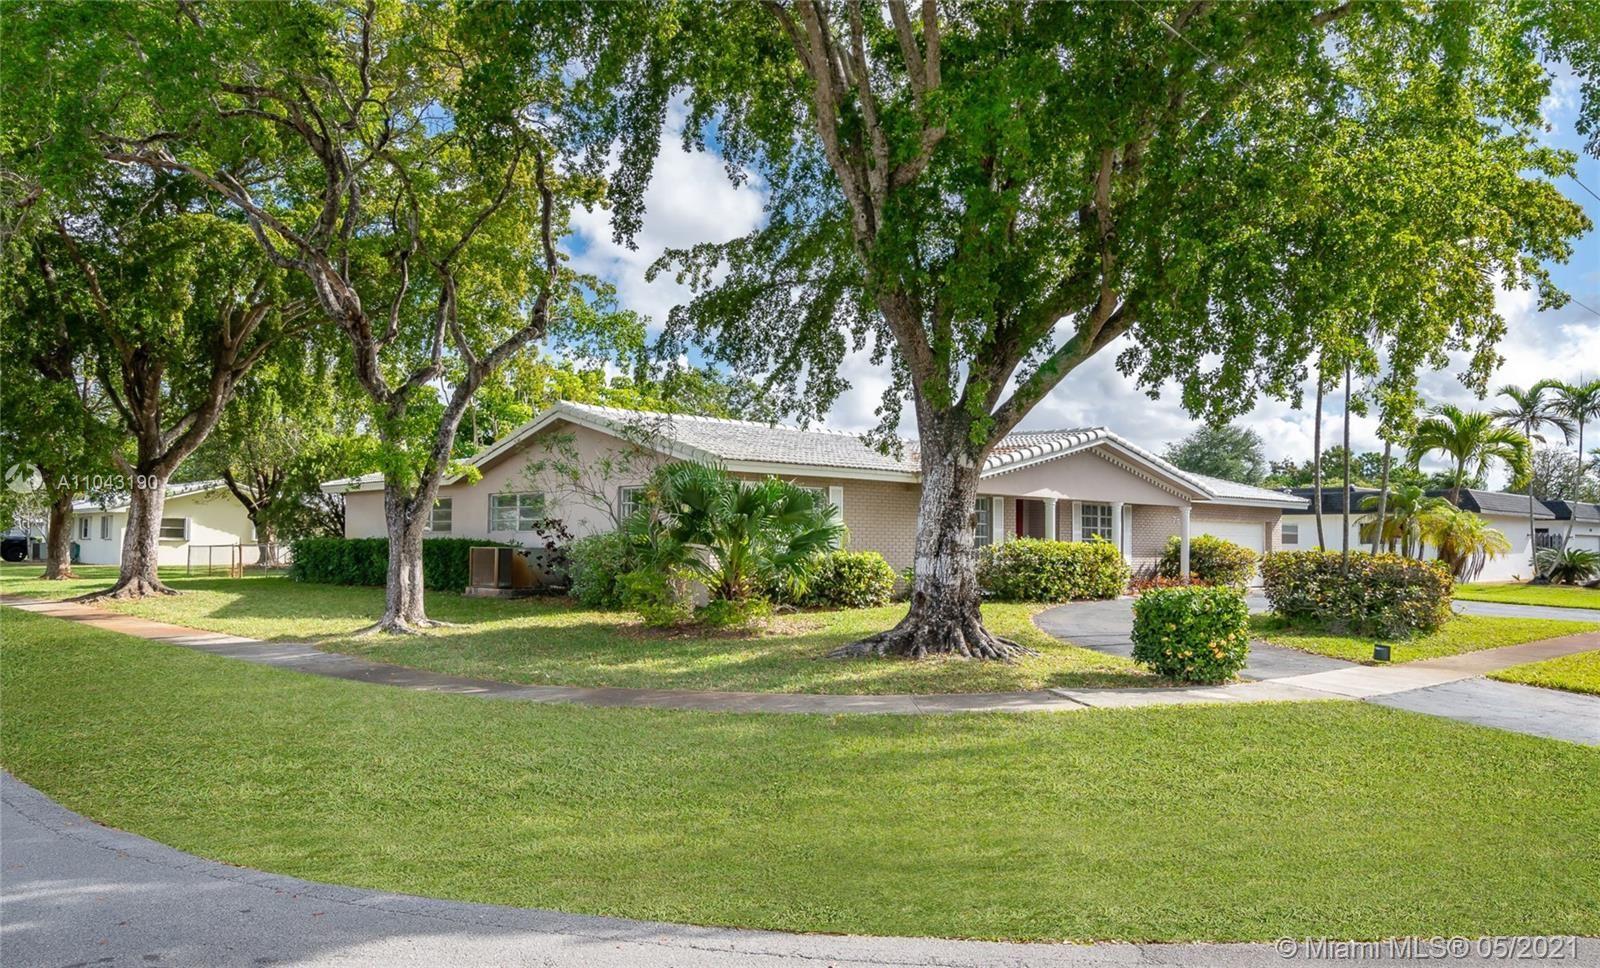 Photo of 7561 Plantation Rd, Plantation, FL 33317 (MLS # A11043190)